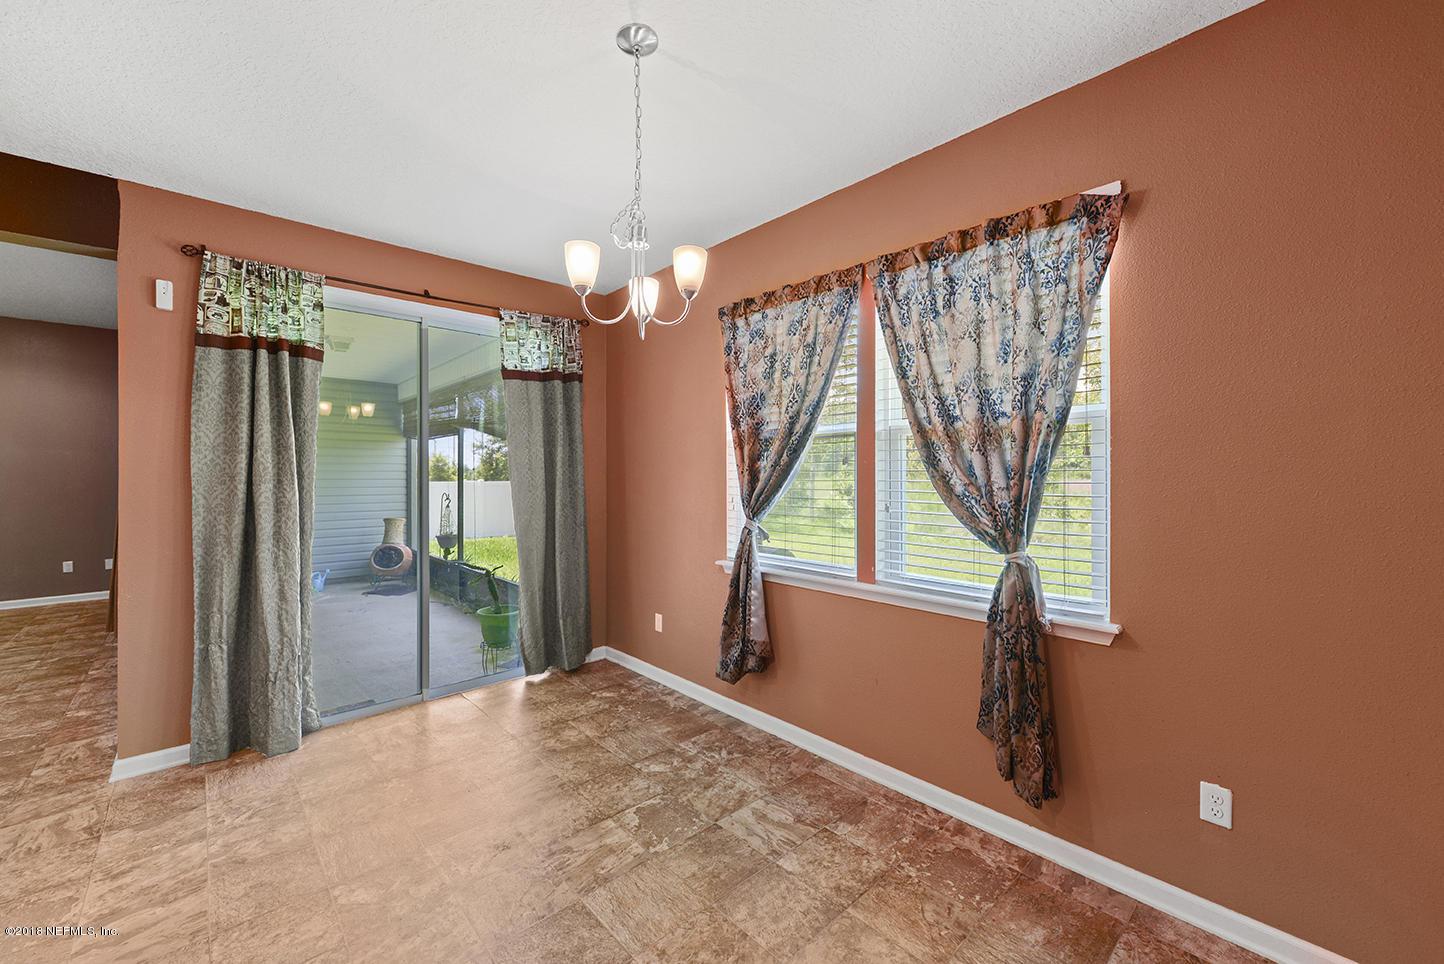 1066 WETLAND RIDGE, MIDDLEBURG, FLORIDA 32068, 3 Bedrooms Bedrooms, ,2 BathroomsBathrooms,Residential - single family,For sale,WETLAND RIDGE,943494